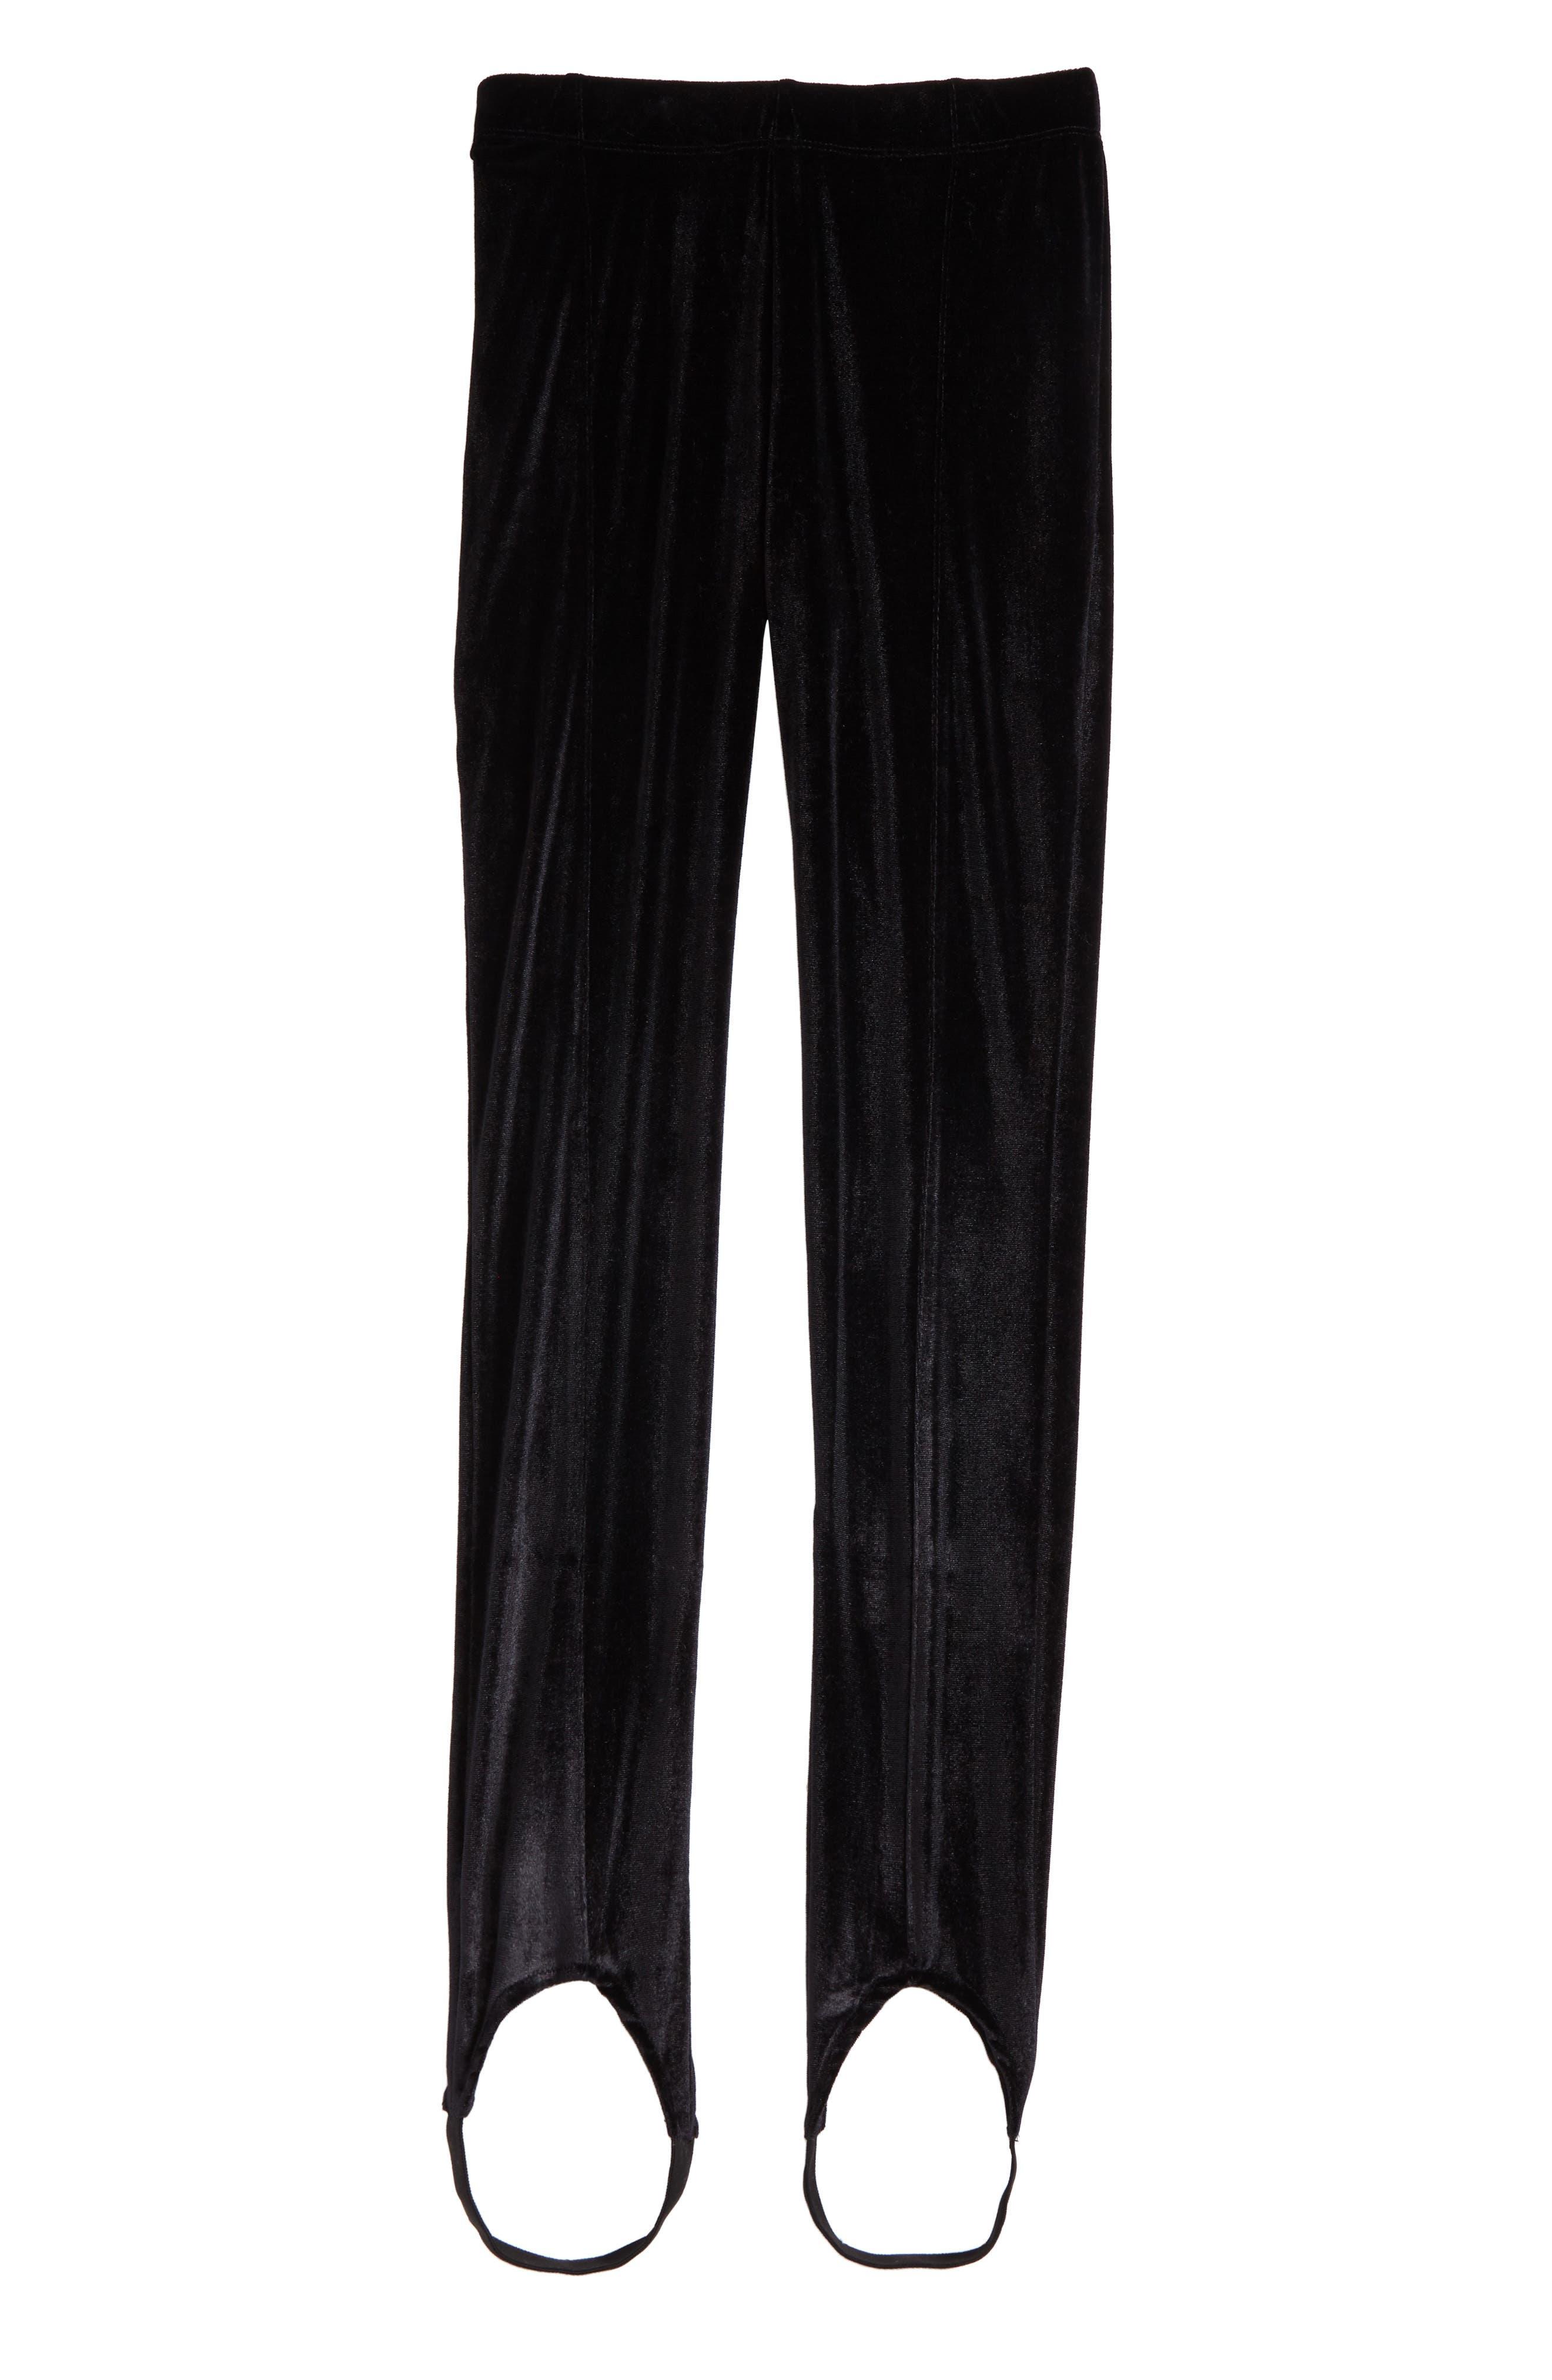 Velvet Stirrup Pants,                         Main,                         color, Black